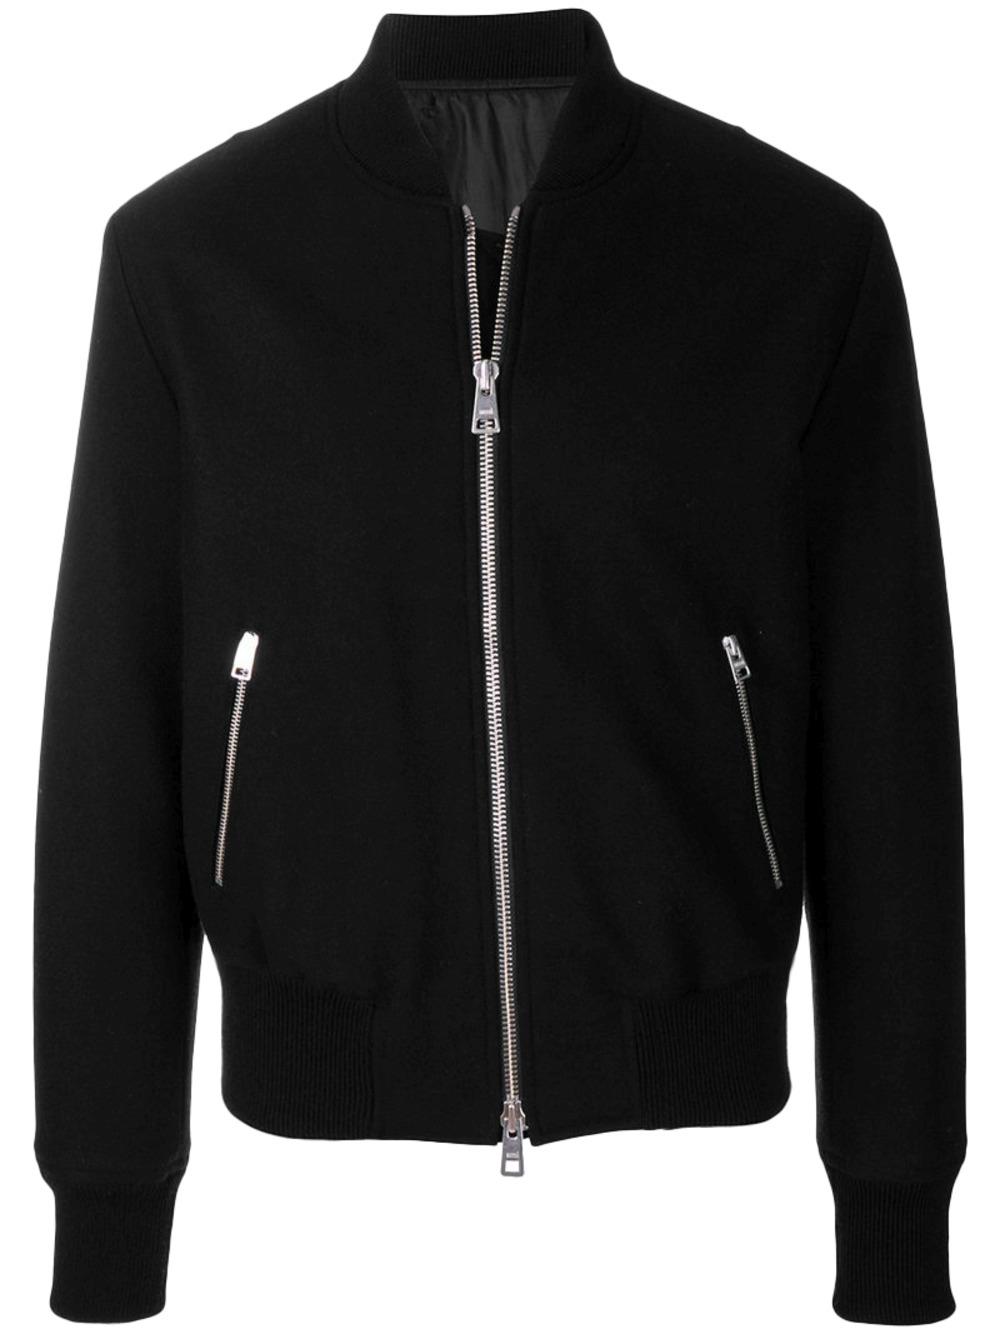 Мужское зимнее пальто арт.501